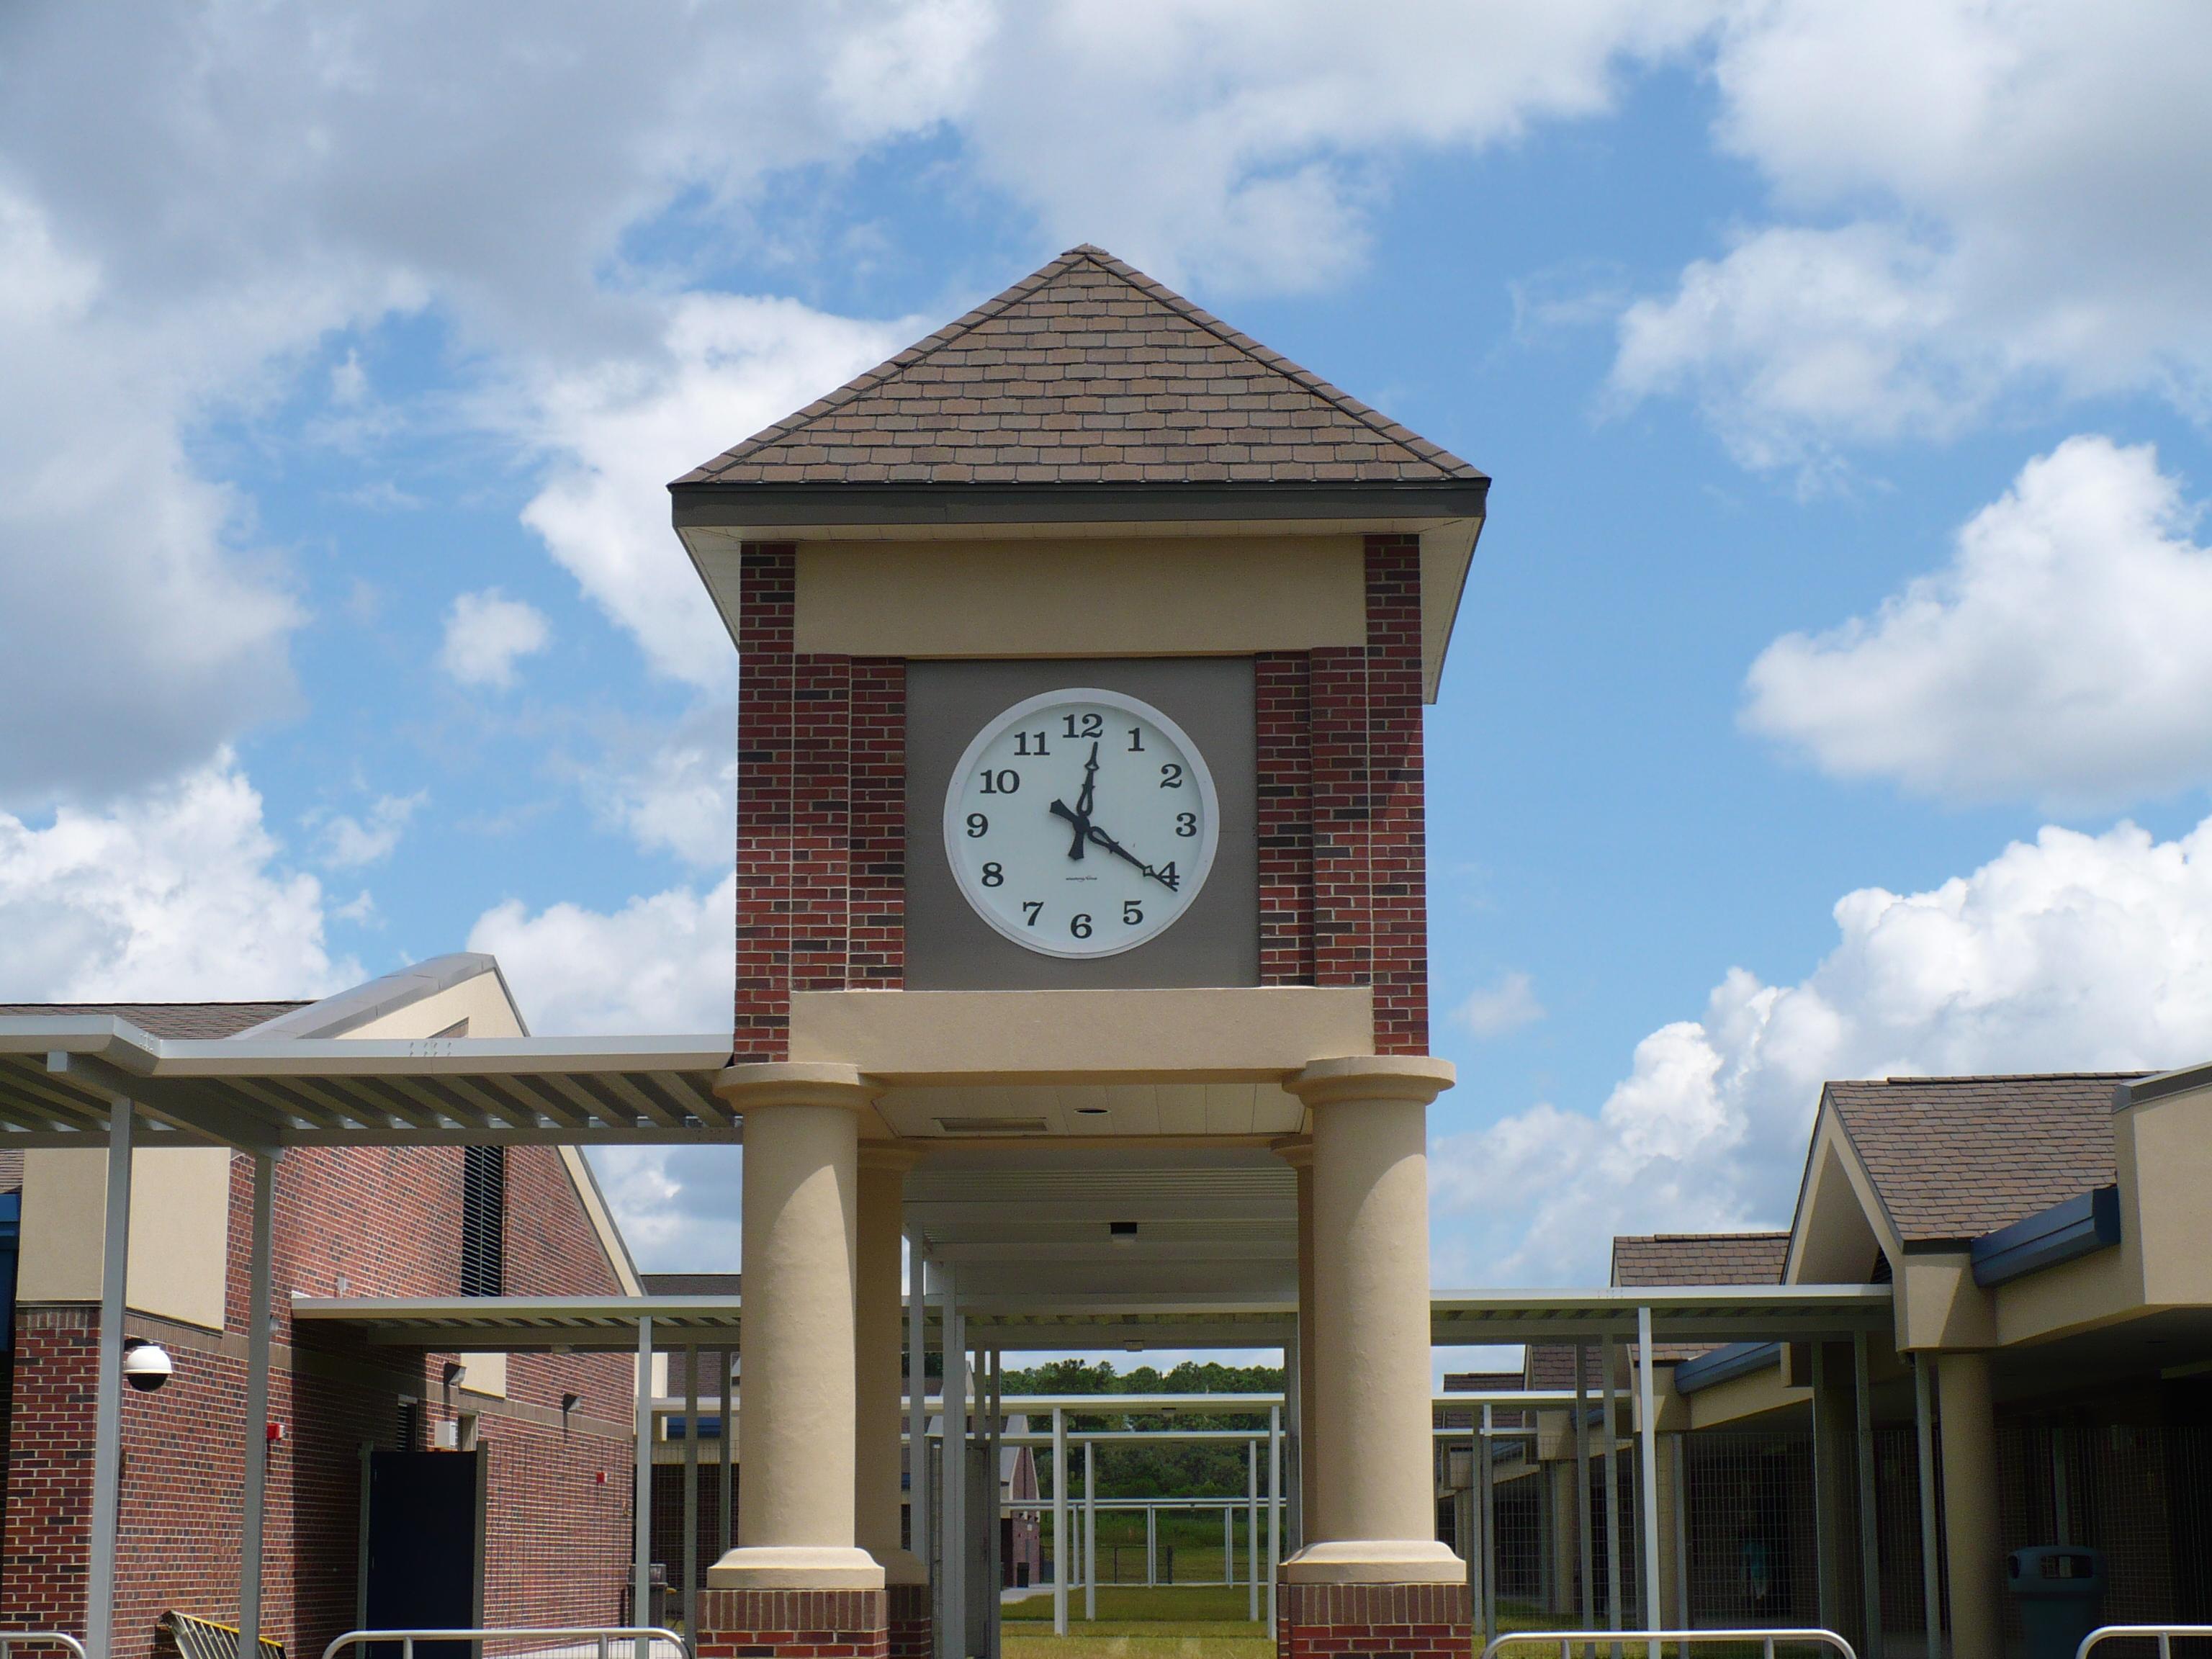 File:Conley Elementary School Clock Tower.JPG